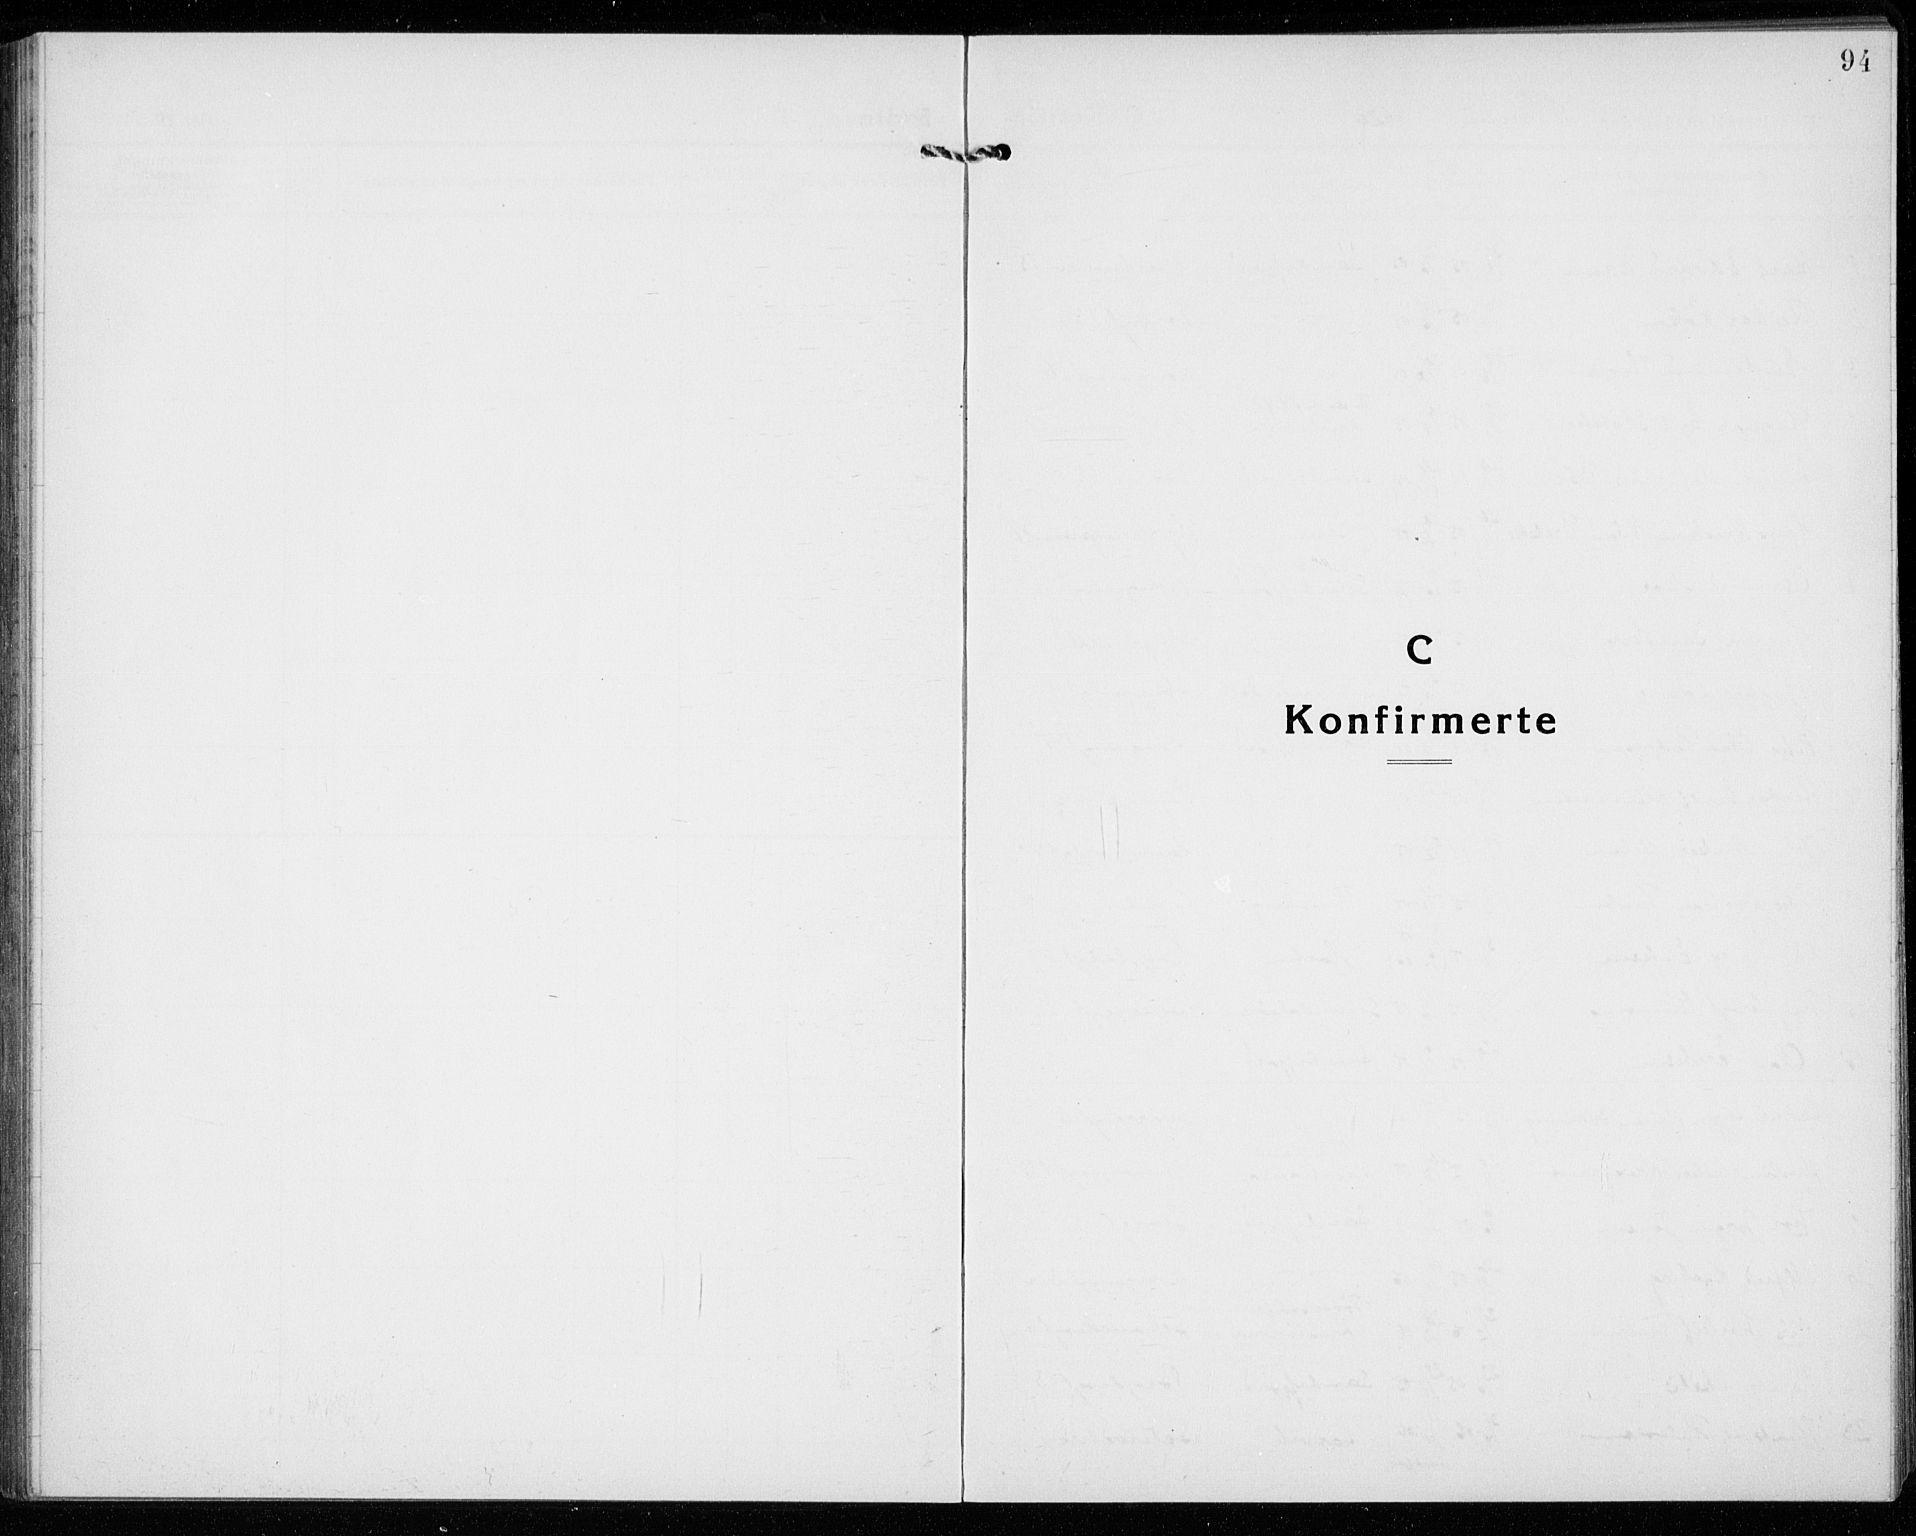 SAKO, Sandefjord kirkebøker, G/Ga/L0004: Klokkerbok nr. 4, 1920-1931, s. 94